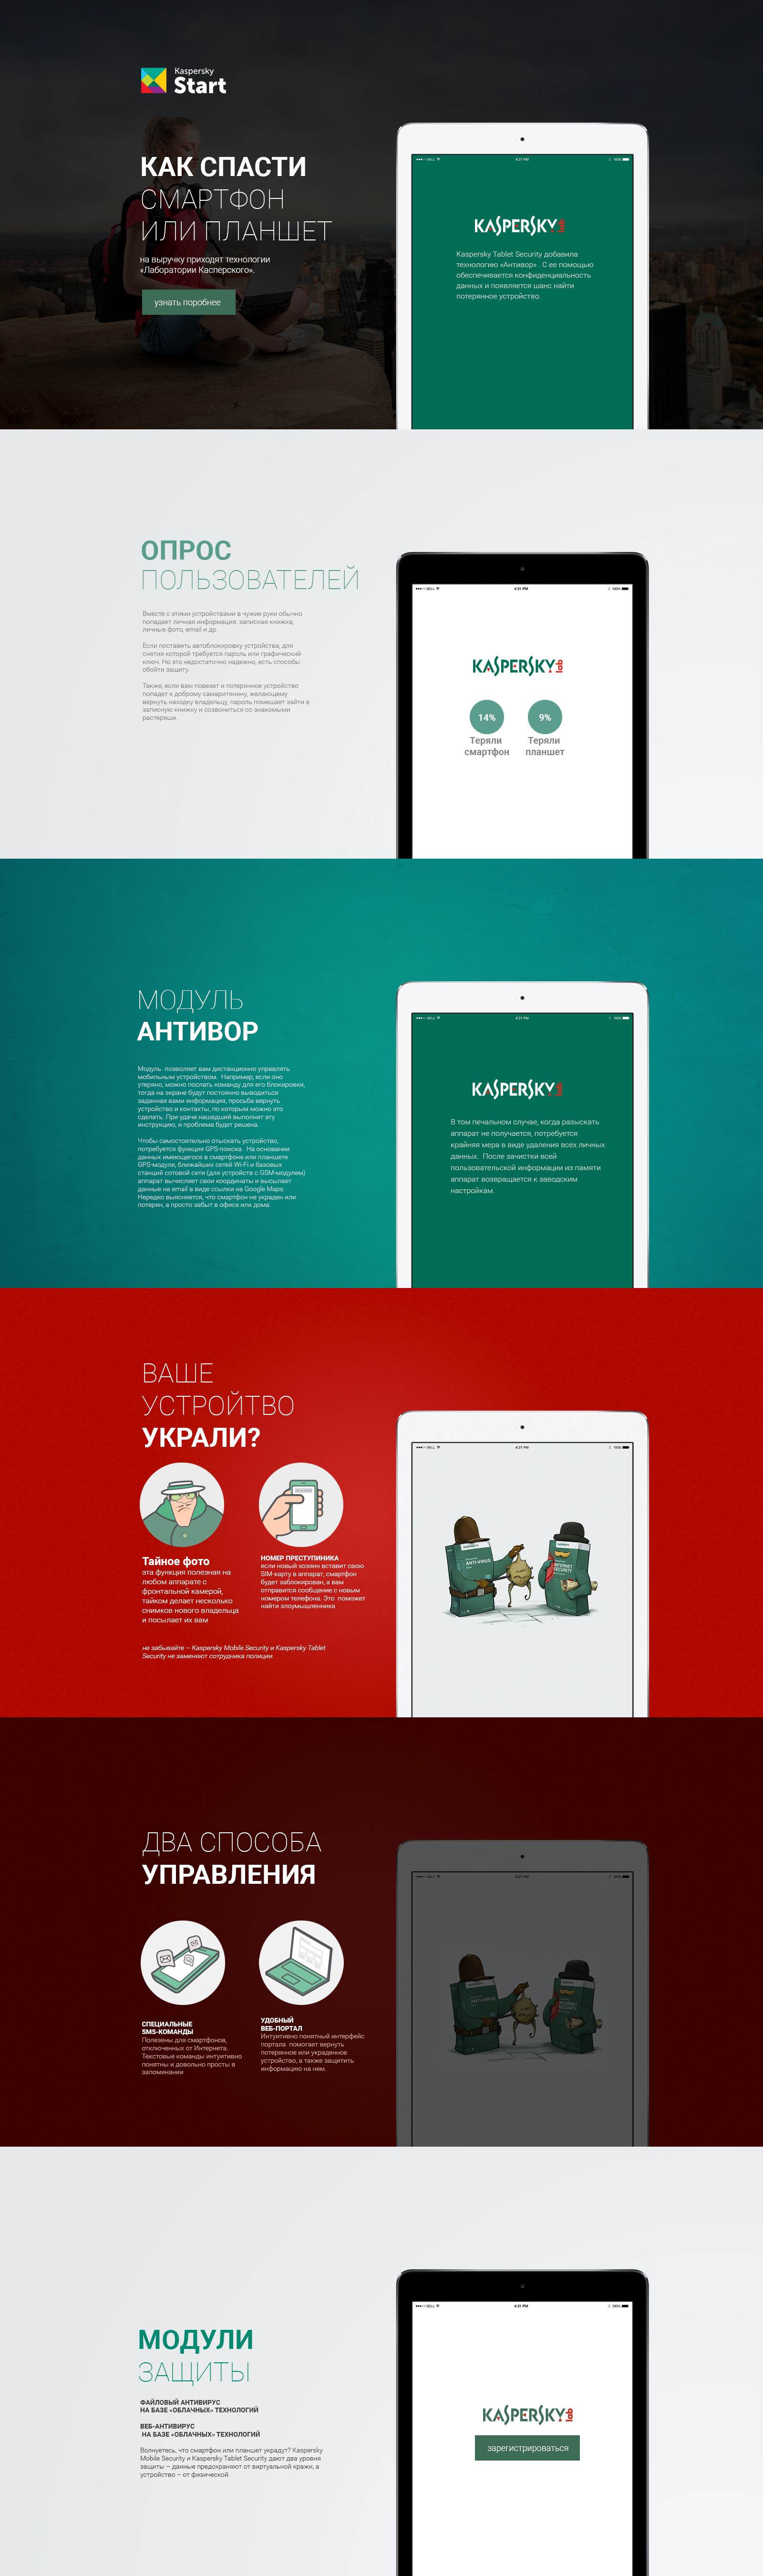 Промо-сайт Kaspersky